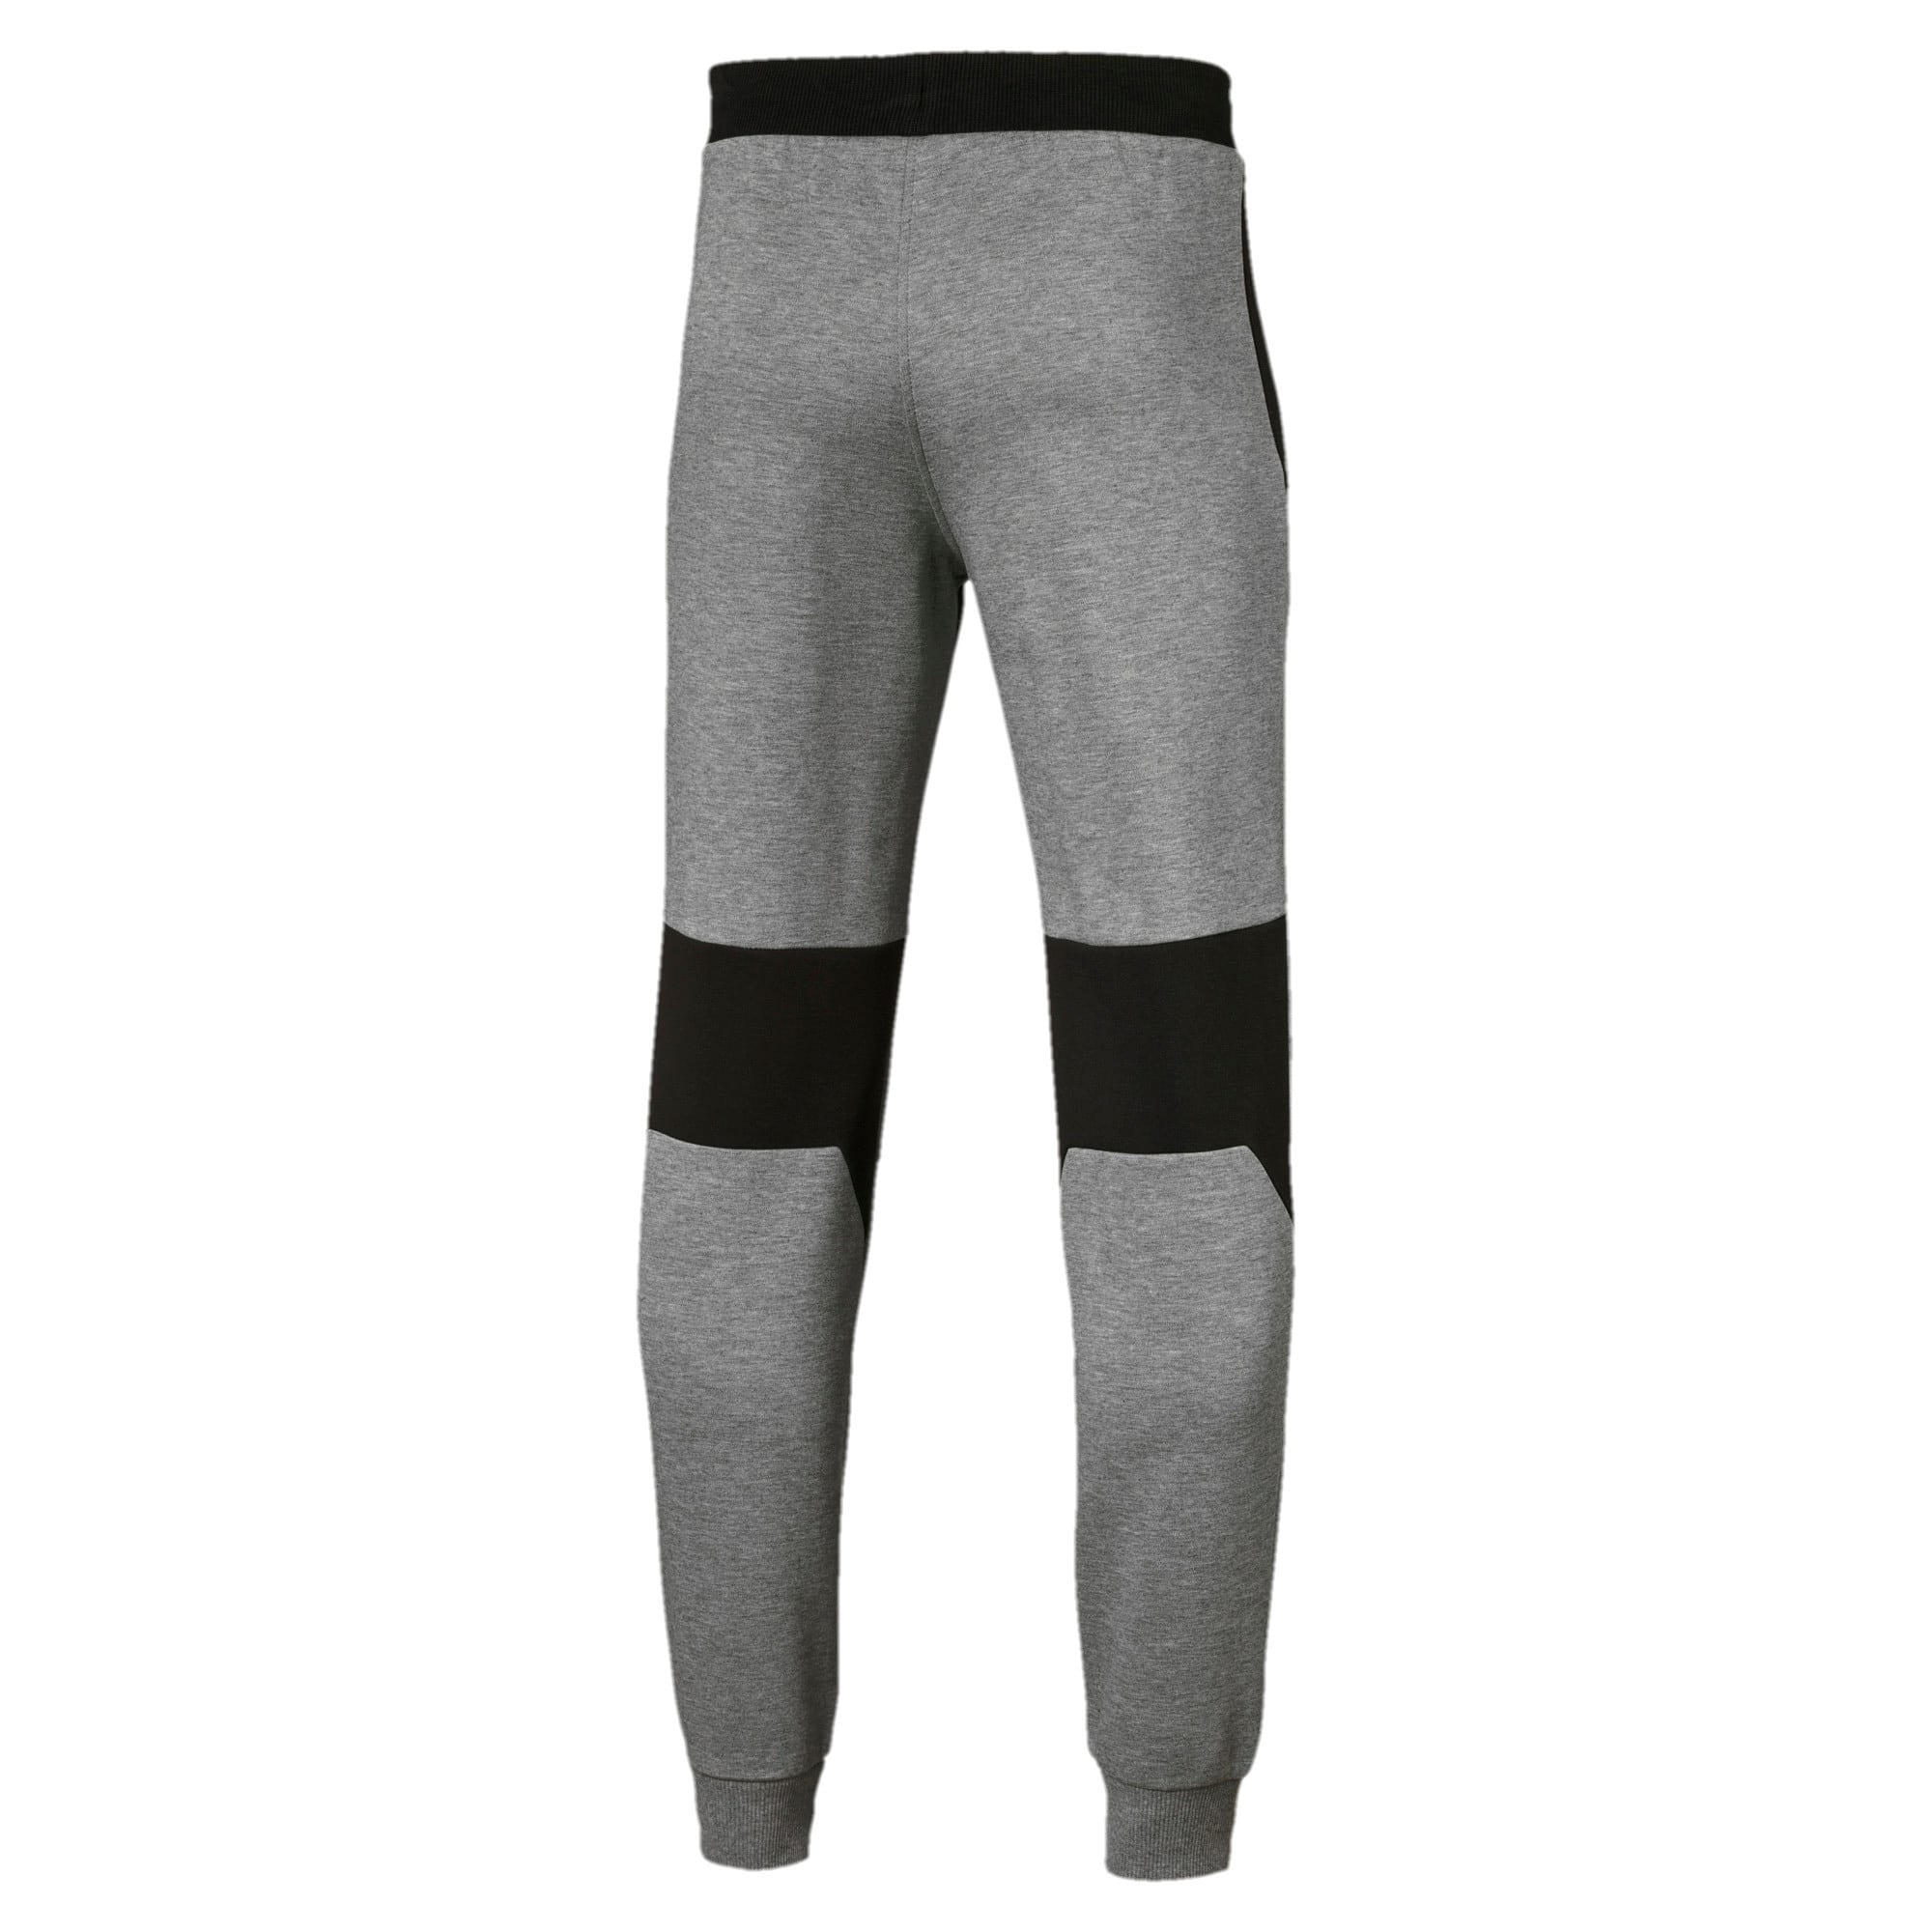 Thumbnail 4 of Ferrari Men's Sweatpants, Medium Gray Heather, medium-IND